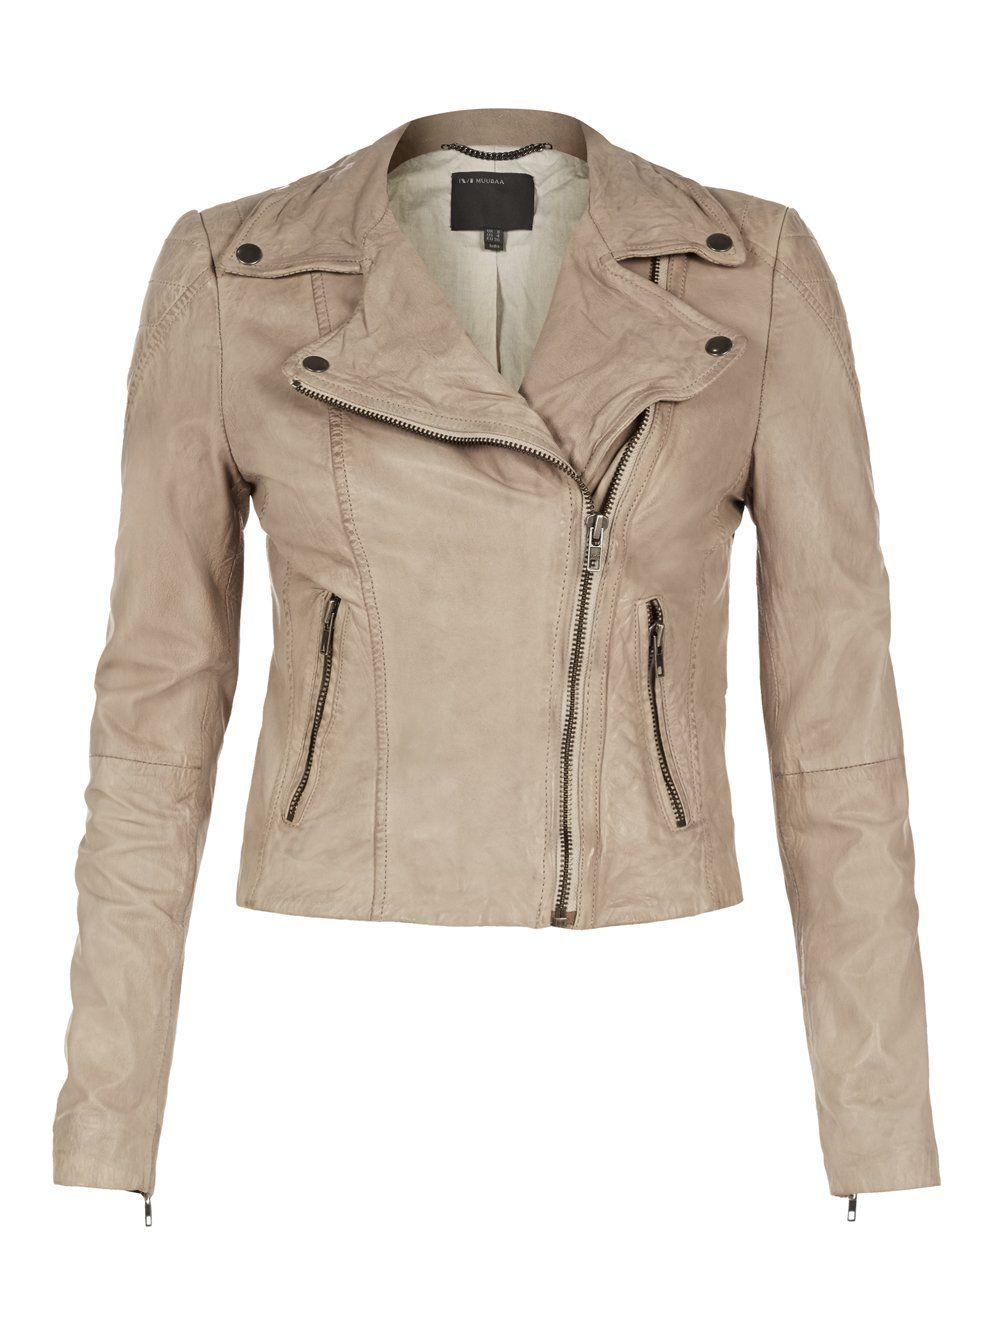 Muubaa Indus Beige Leather Jacket Slightly Cropped Trendy Jackets Beige Leather Jacket Jackets [ 1334 x 1000 Pixel ]